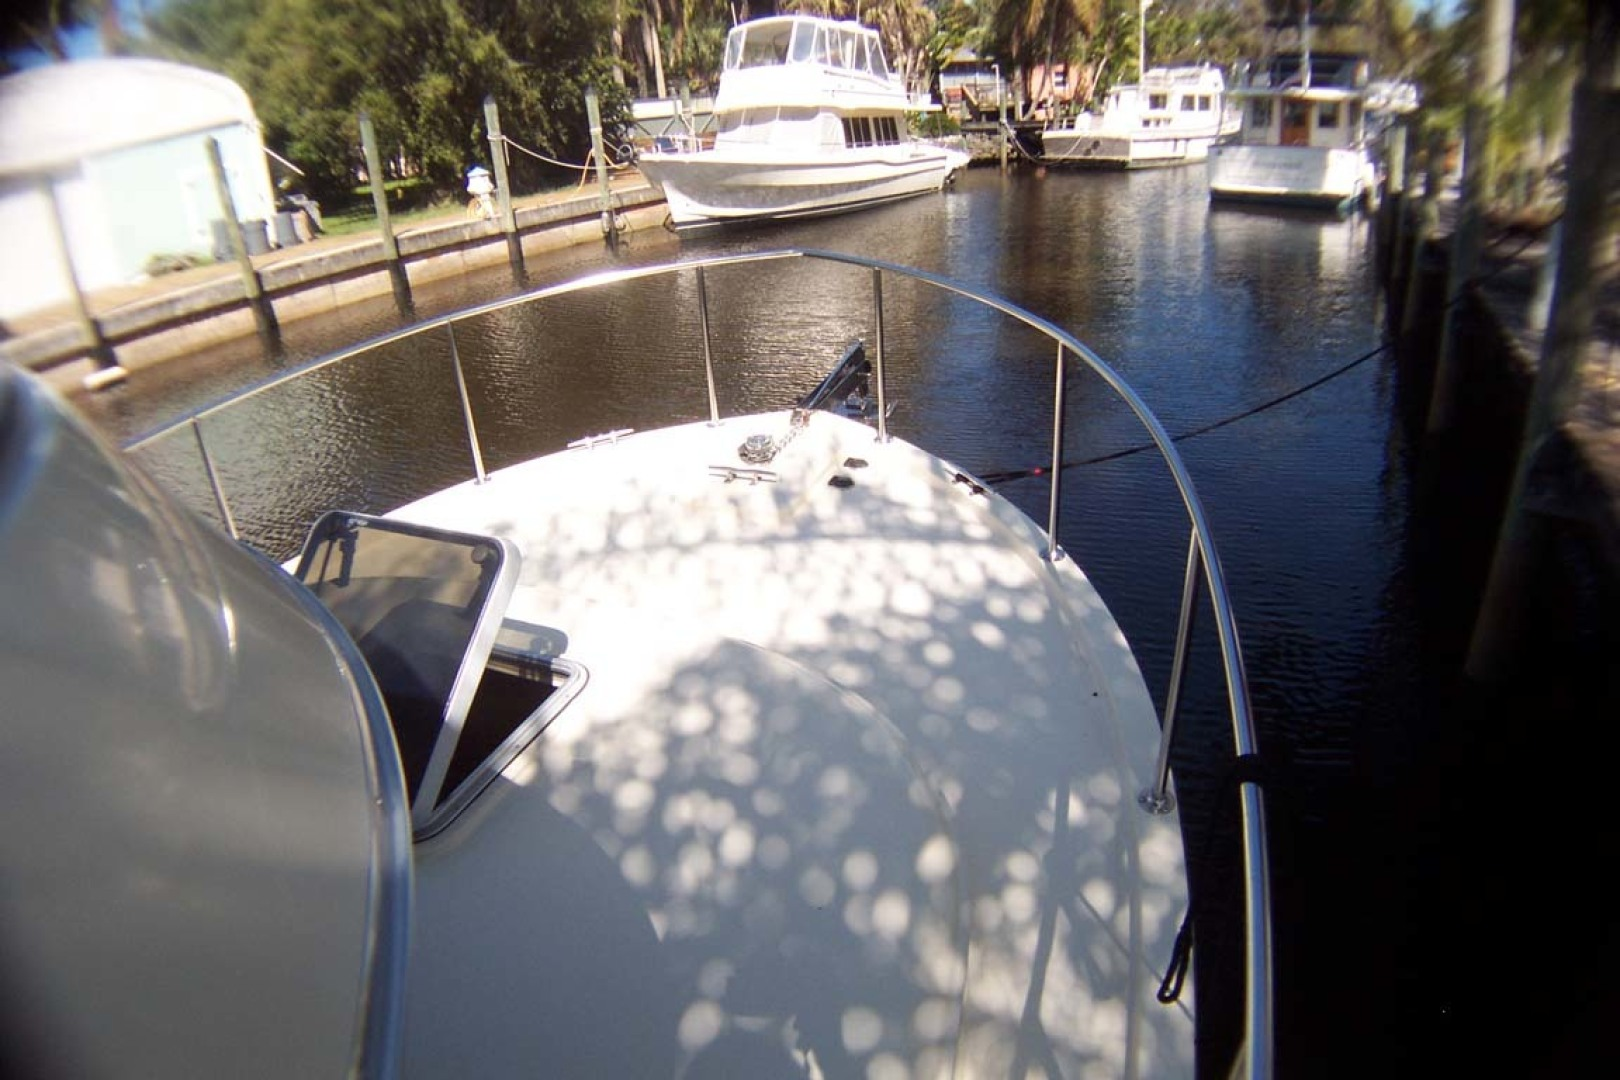 Camano-Troll 2007-NEXT ADVENTURE Stuart-Florida-United States-Bow Cabin Profile-1622015   Thumbnail